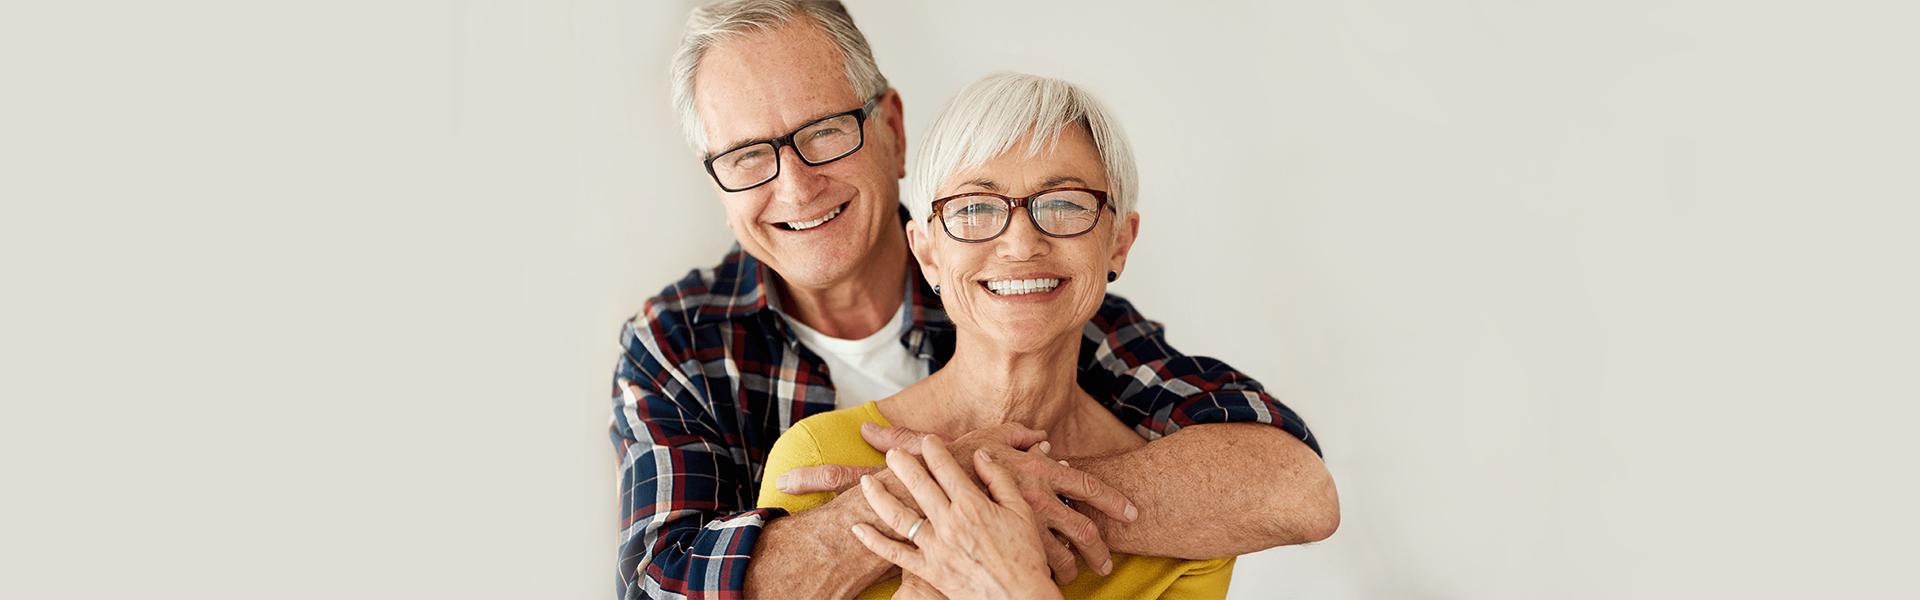 How Dental Implants Help Oral Health